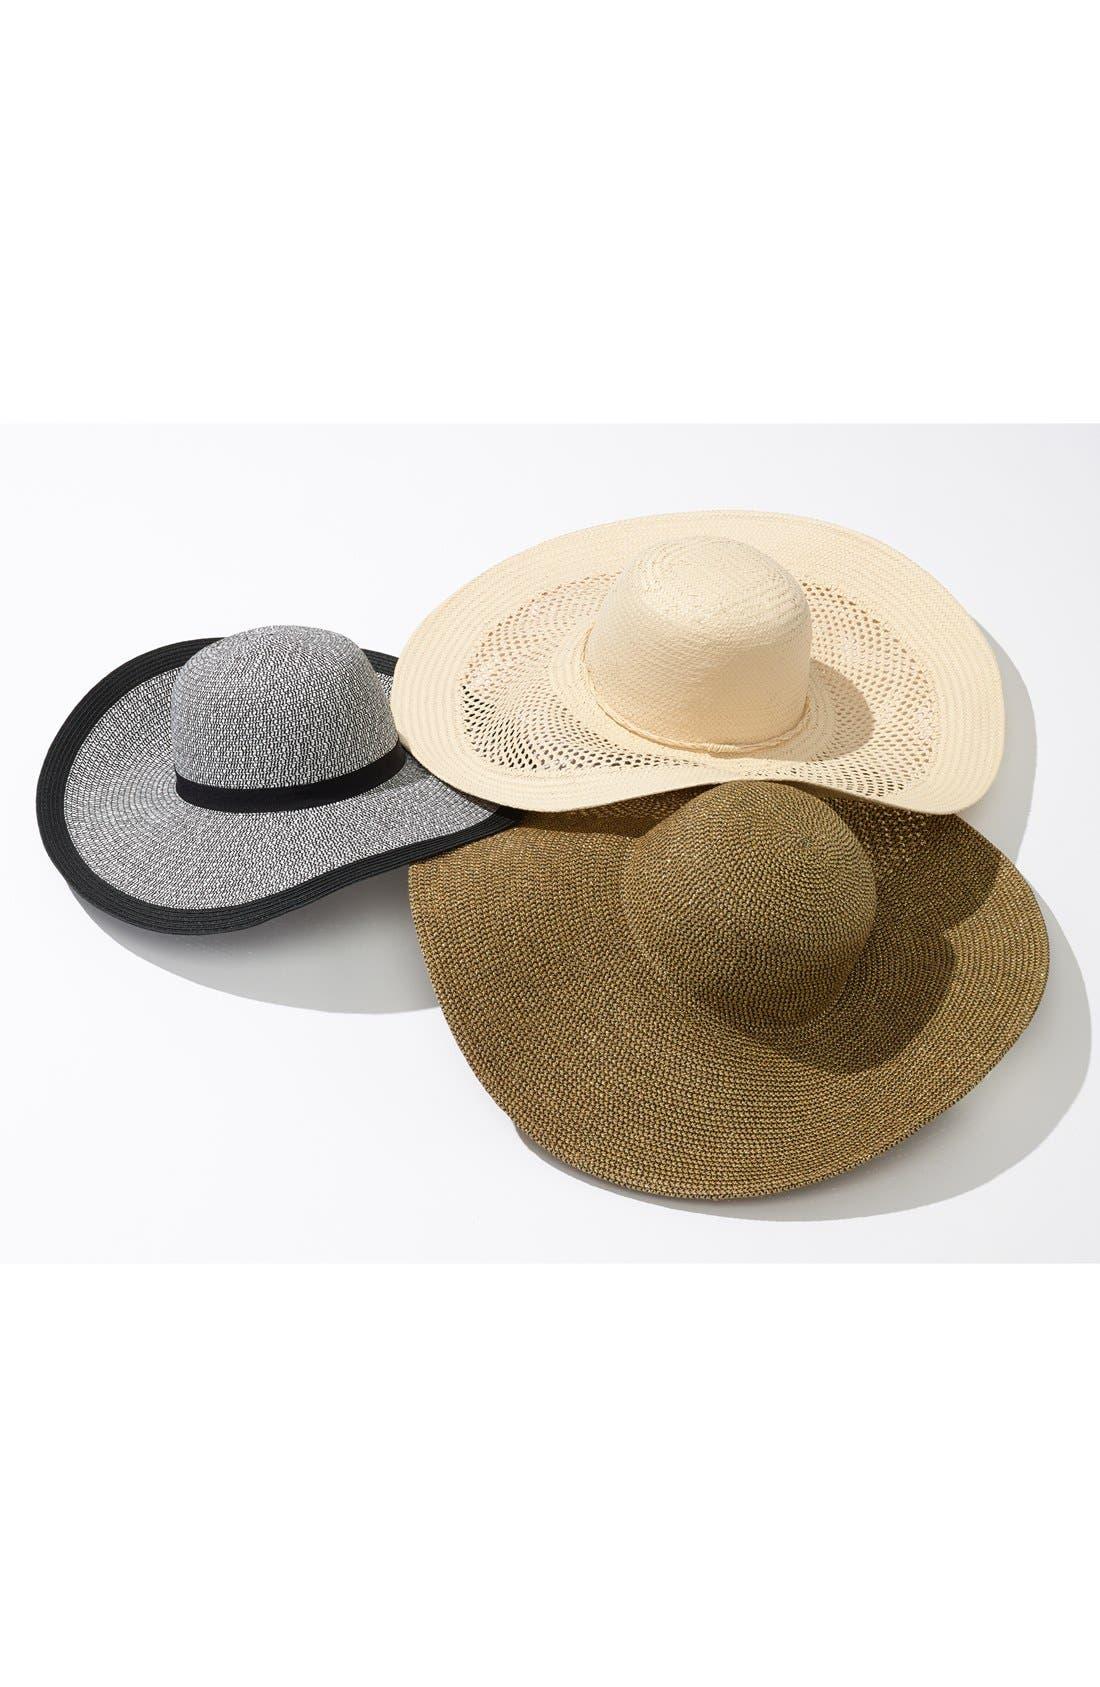 Alternate Image 3  - Phase 3 Metallic Floppy Straw Hat